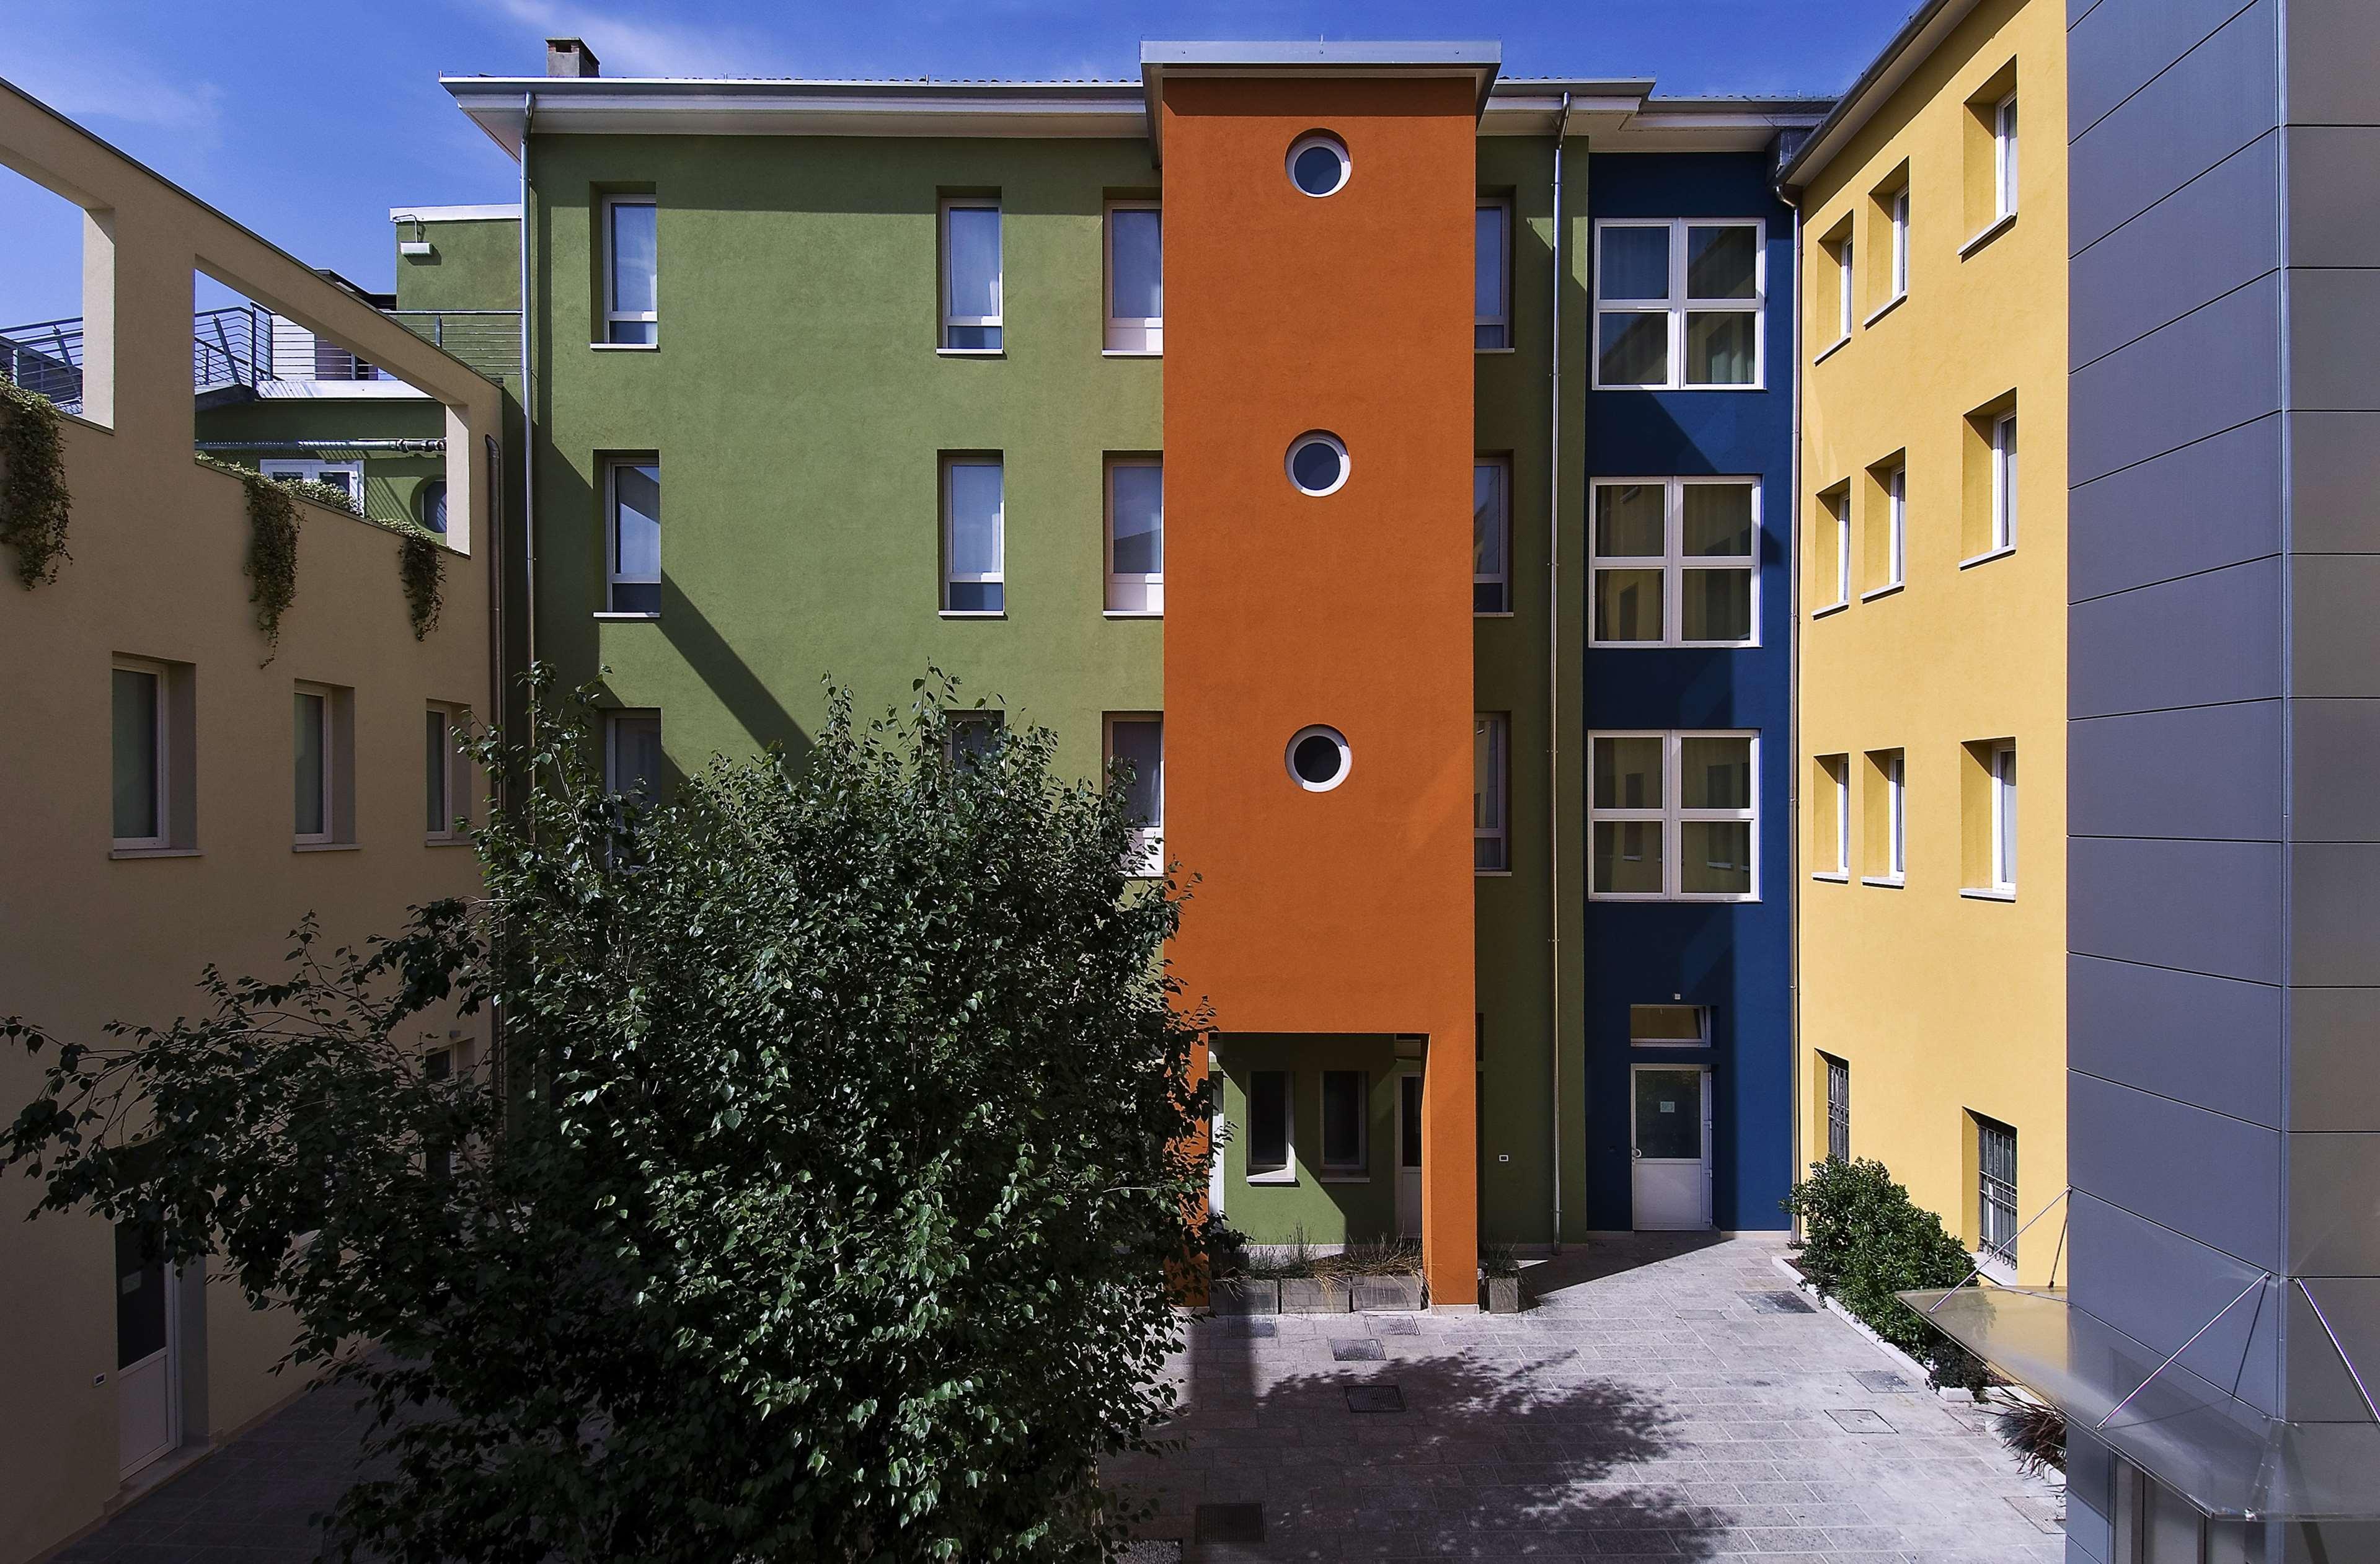 Best western plus hotel bologna alberghi alberghi - Palestra casale sul sile ...